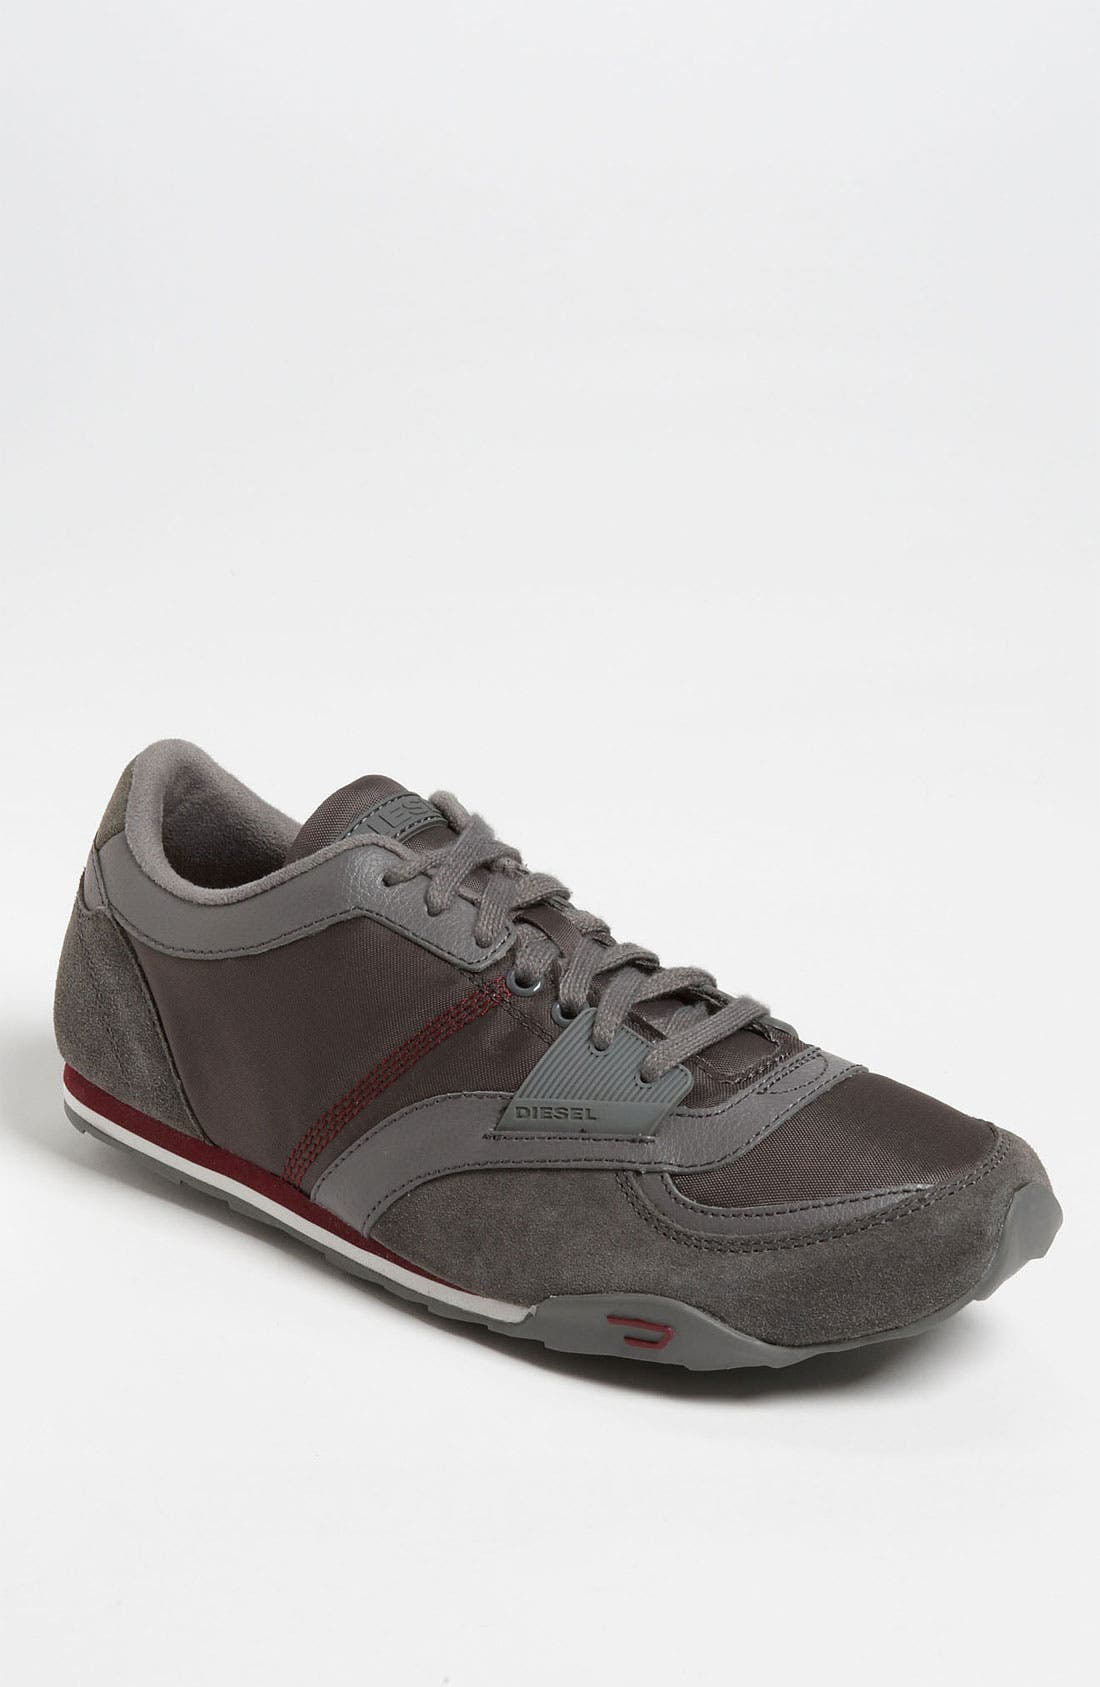 Main Image - DIESEL® 'Matthew' Sneaker